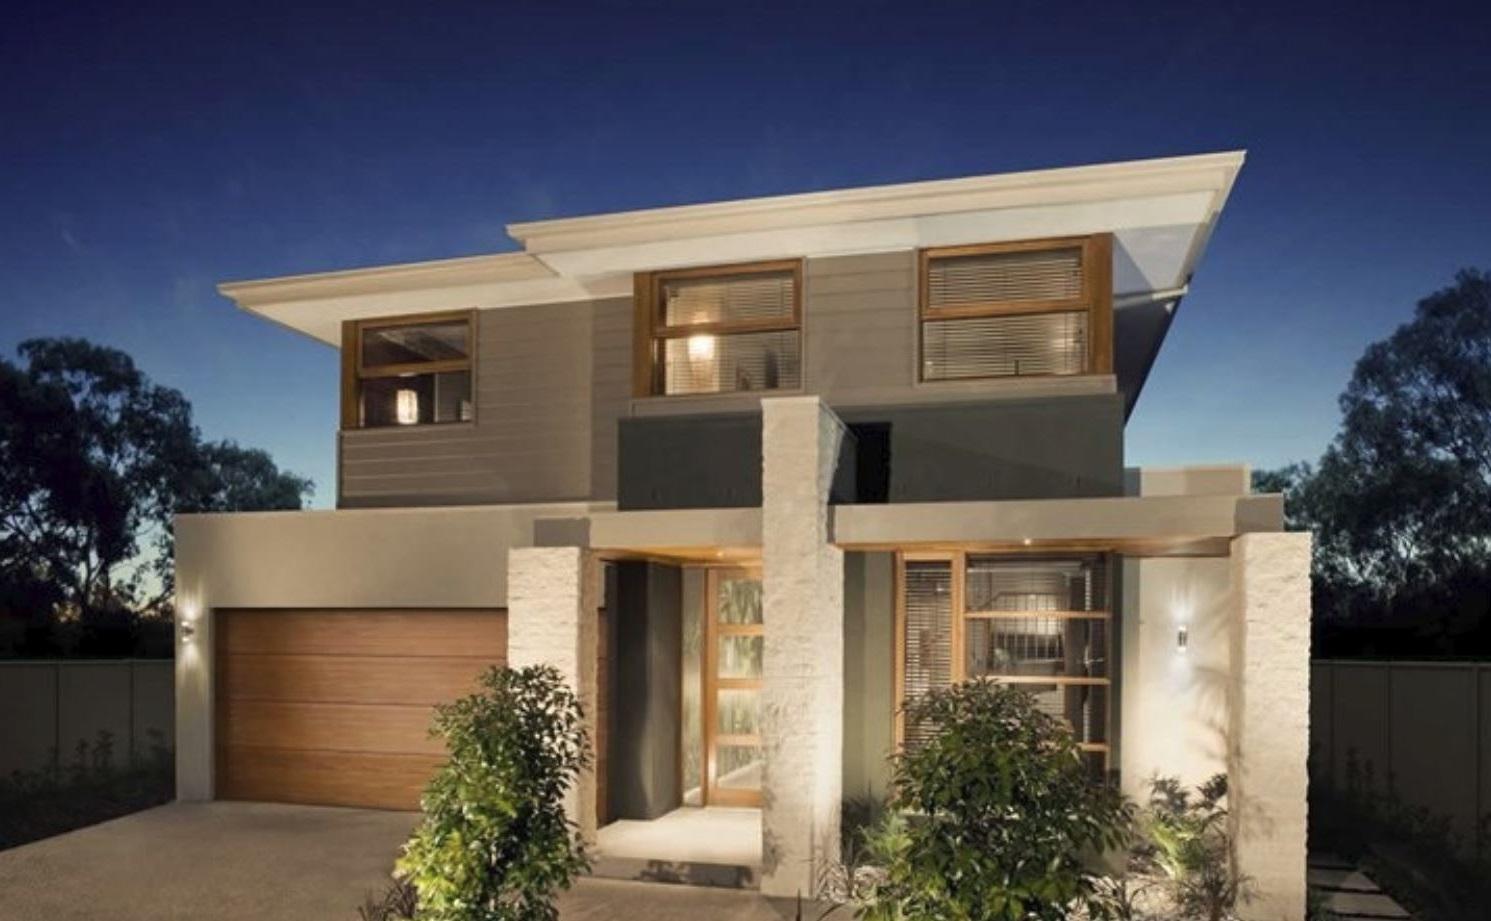 Frentes de casas bonitas for Casas modernas 2 pisos